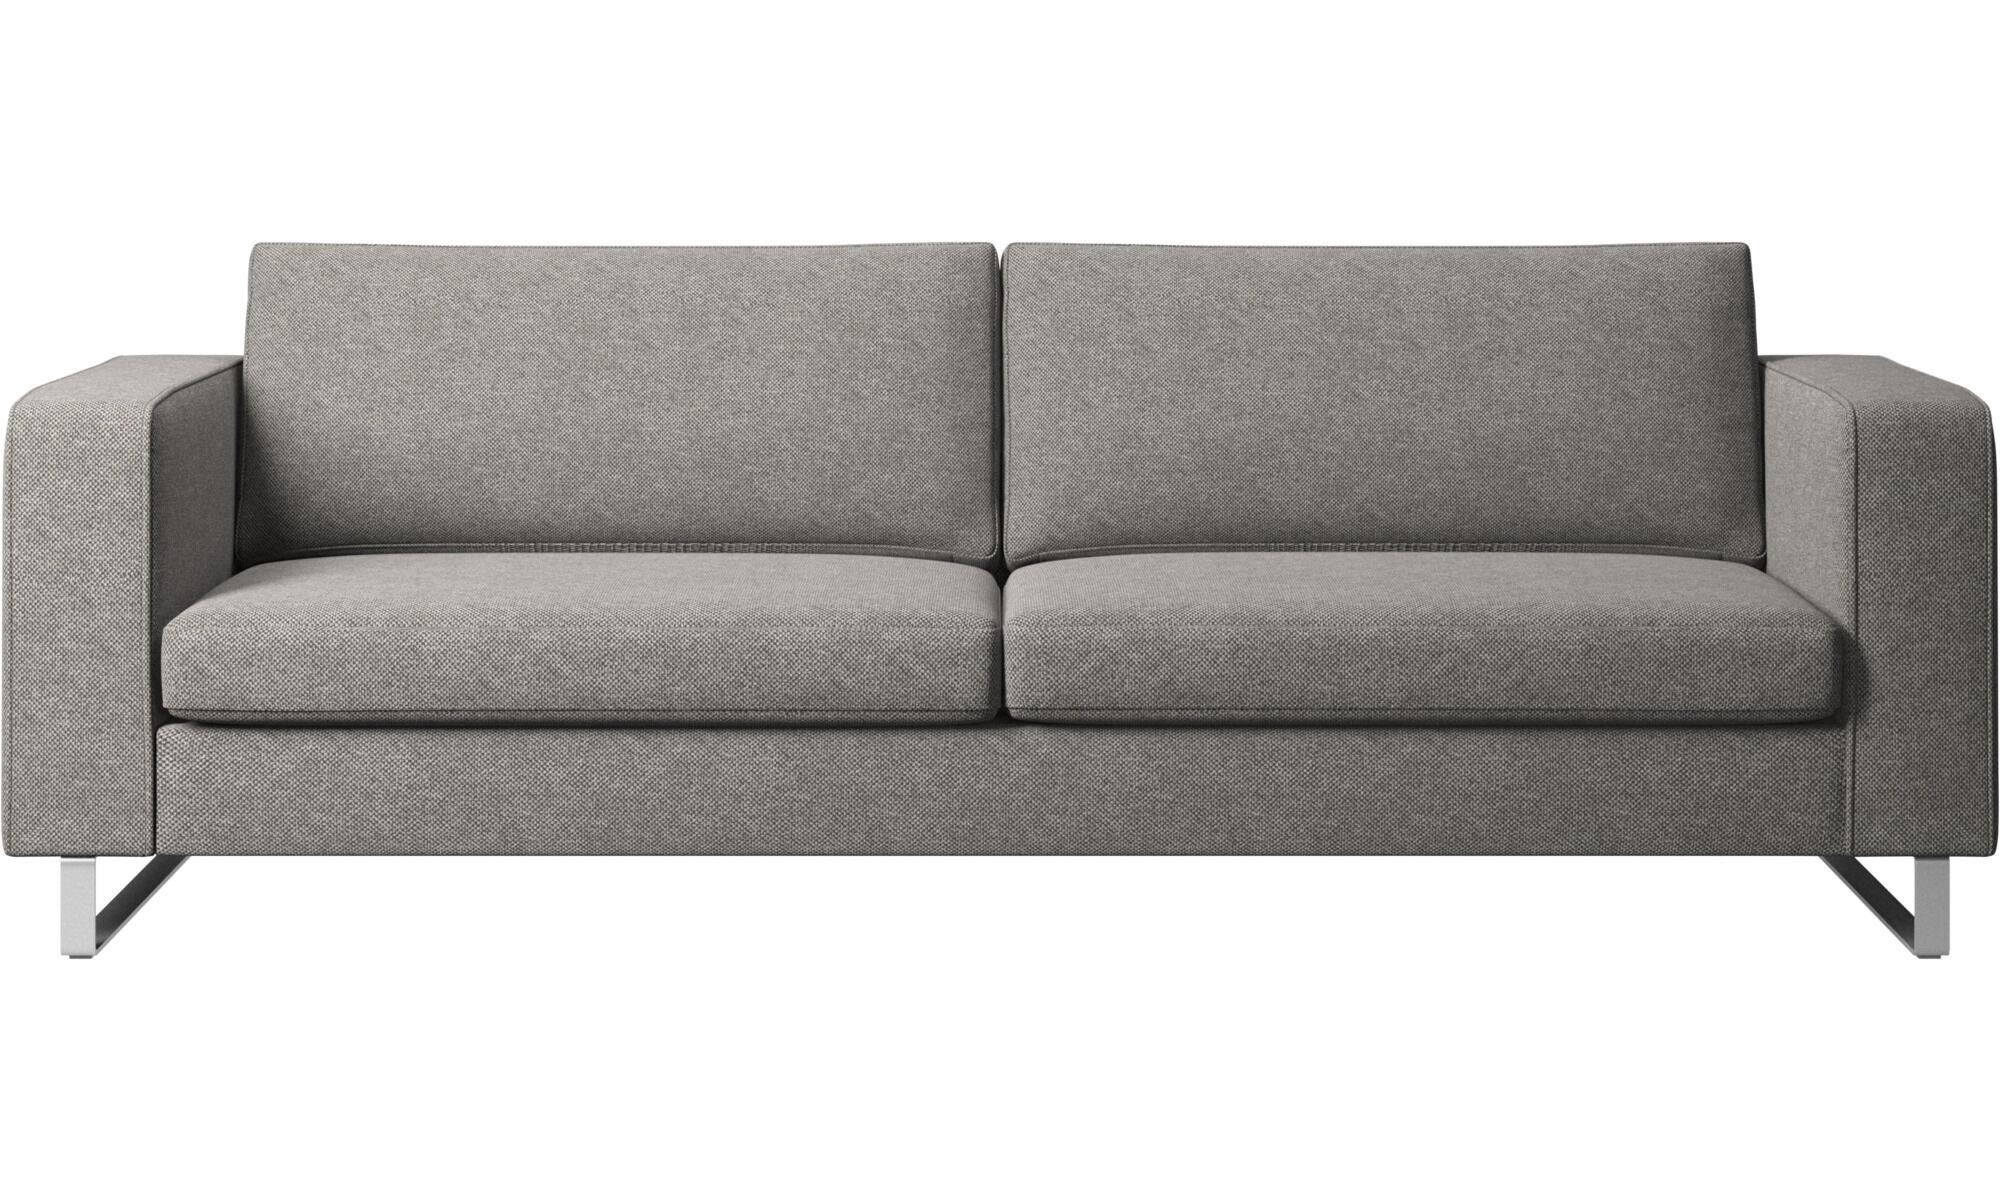 3 Seater Sofas   Indivi 2 Sofa   Gray   Fabric ...